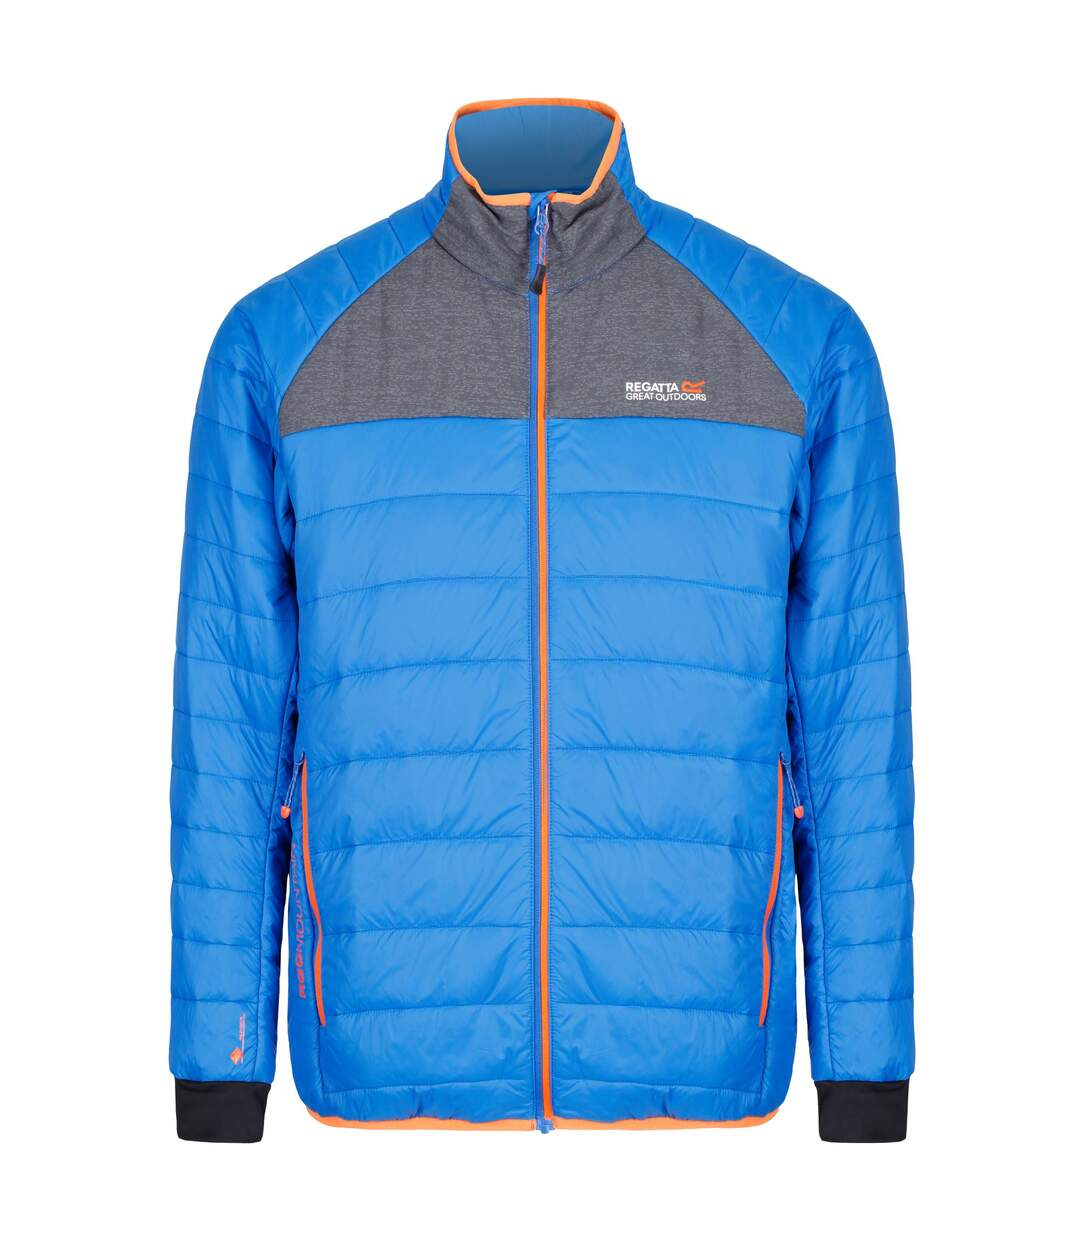 Regatta Mens Halton II Full Zip Jacket (Oxford Blue/Seal Grey) - UTRG3671